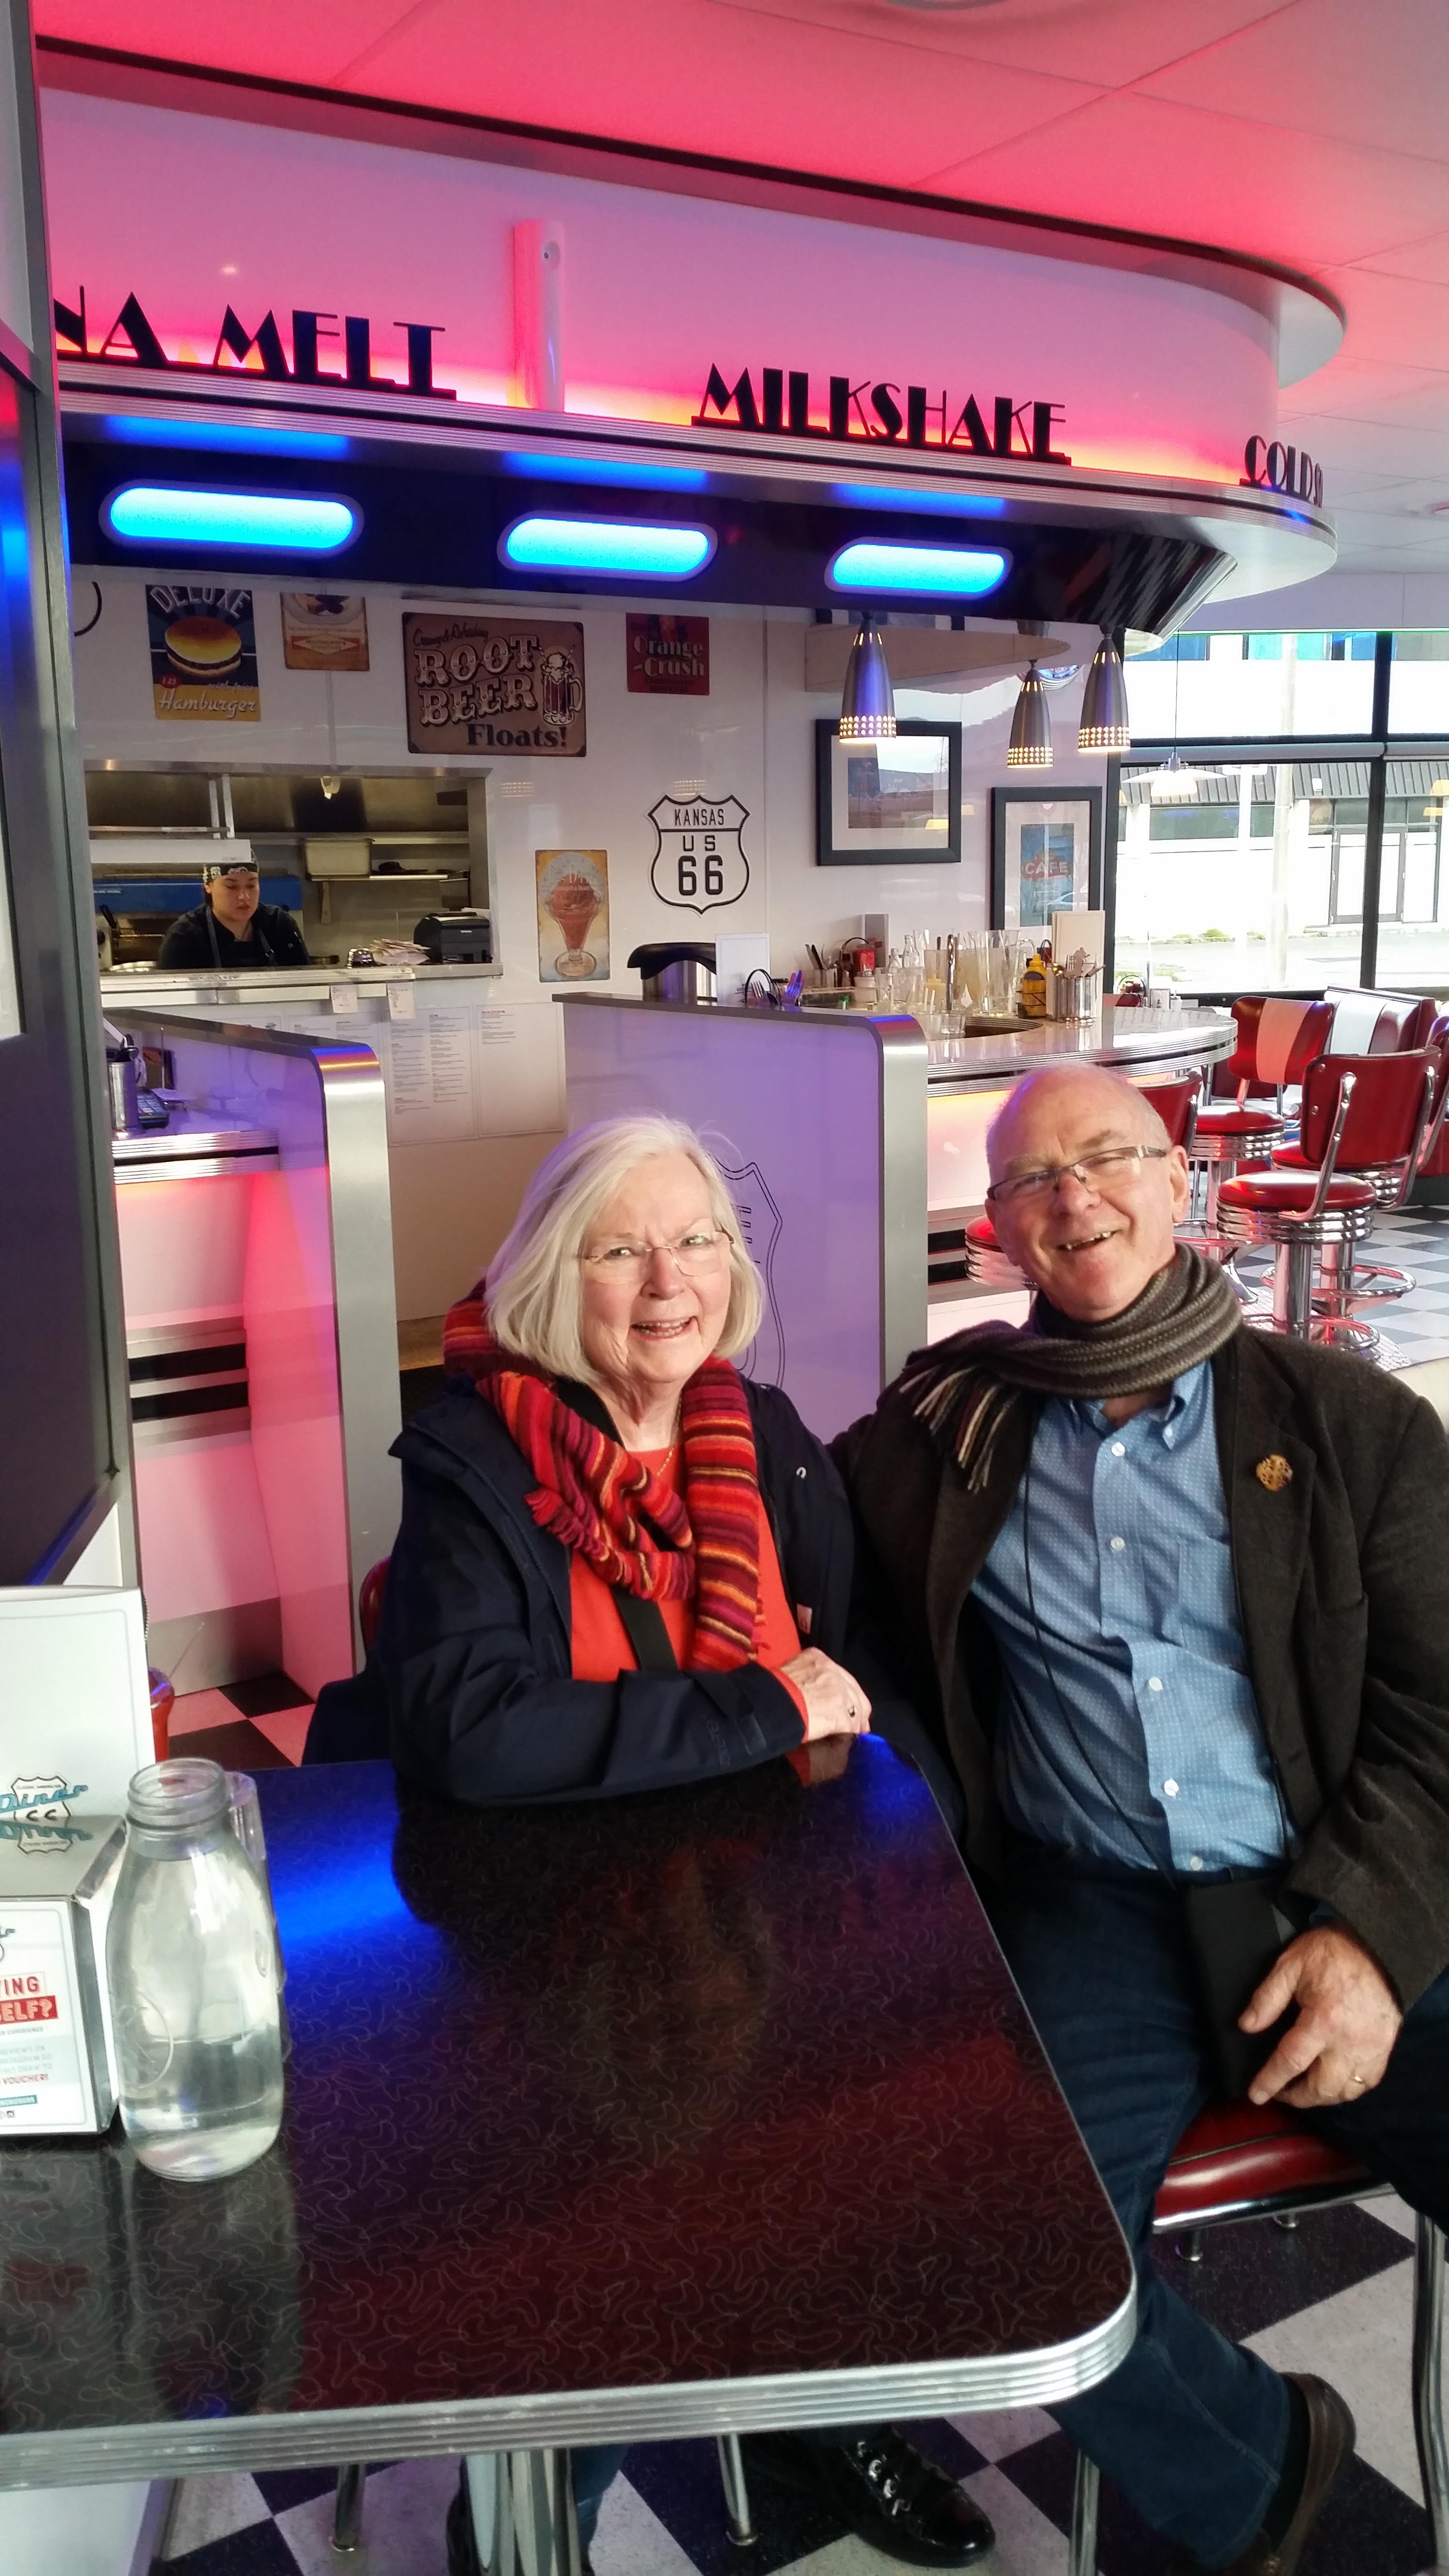 NZ Christchurch USA Route 66 Cafe